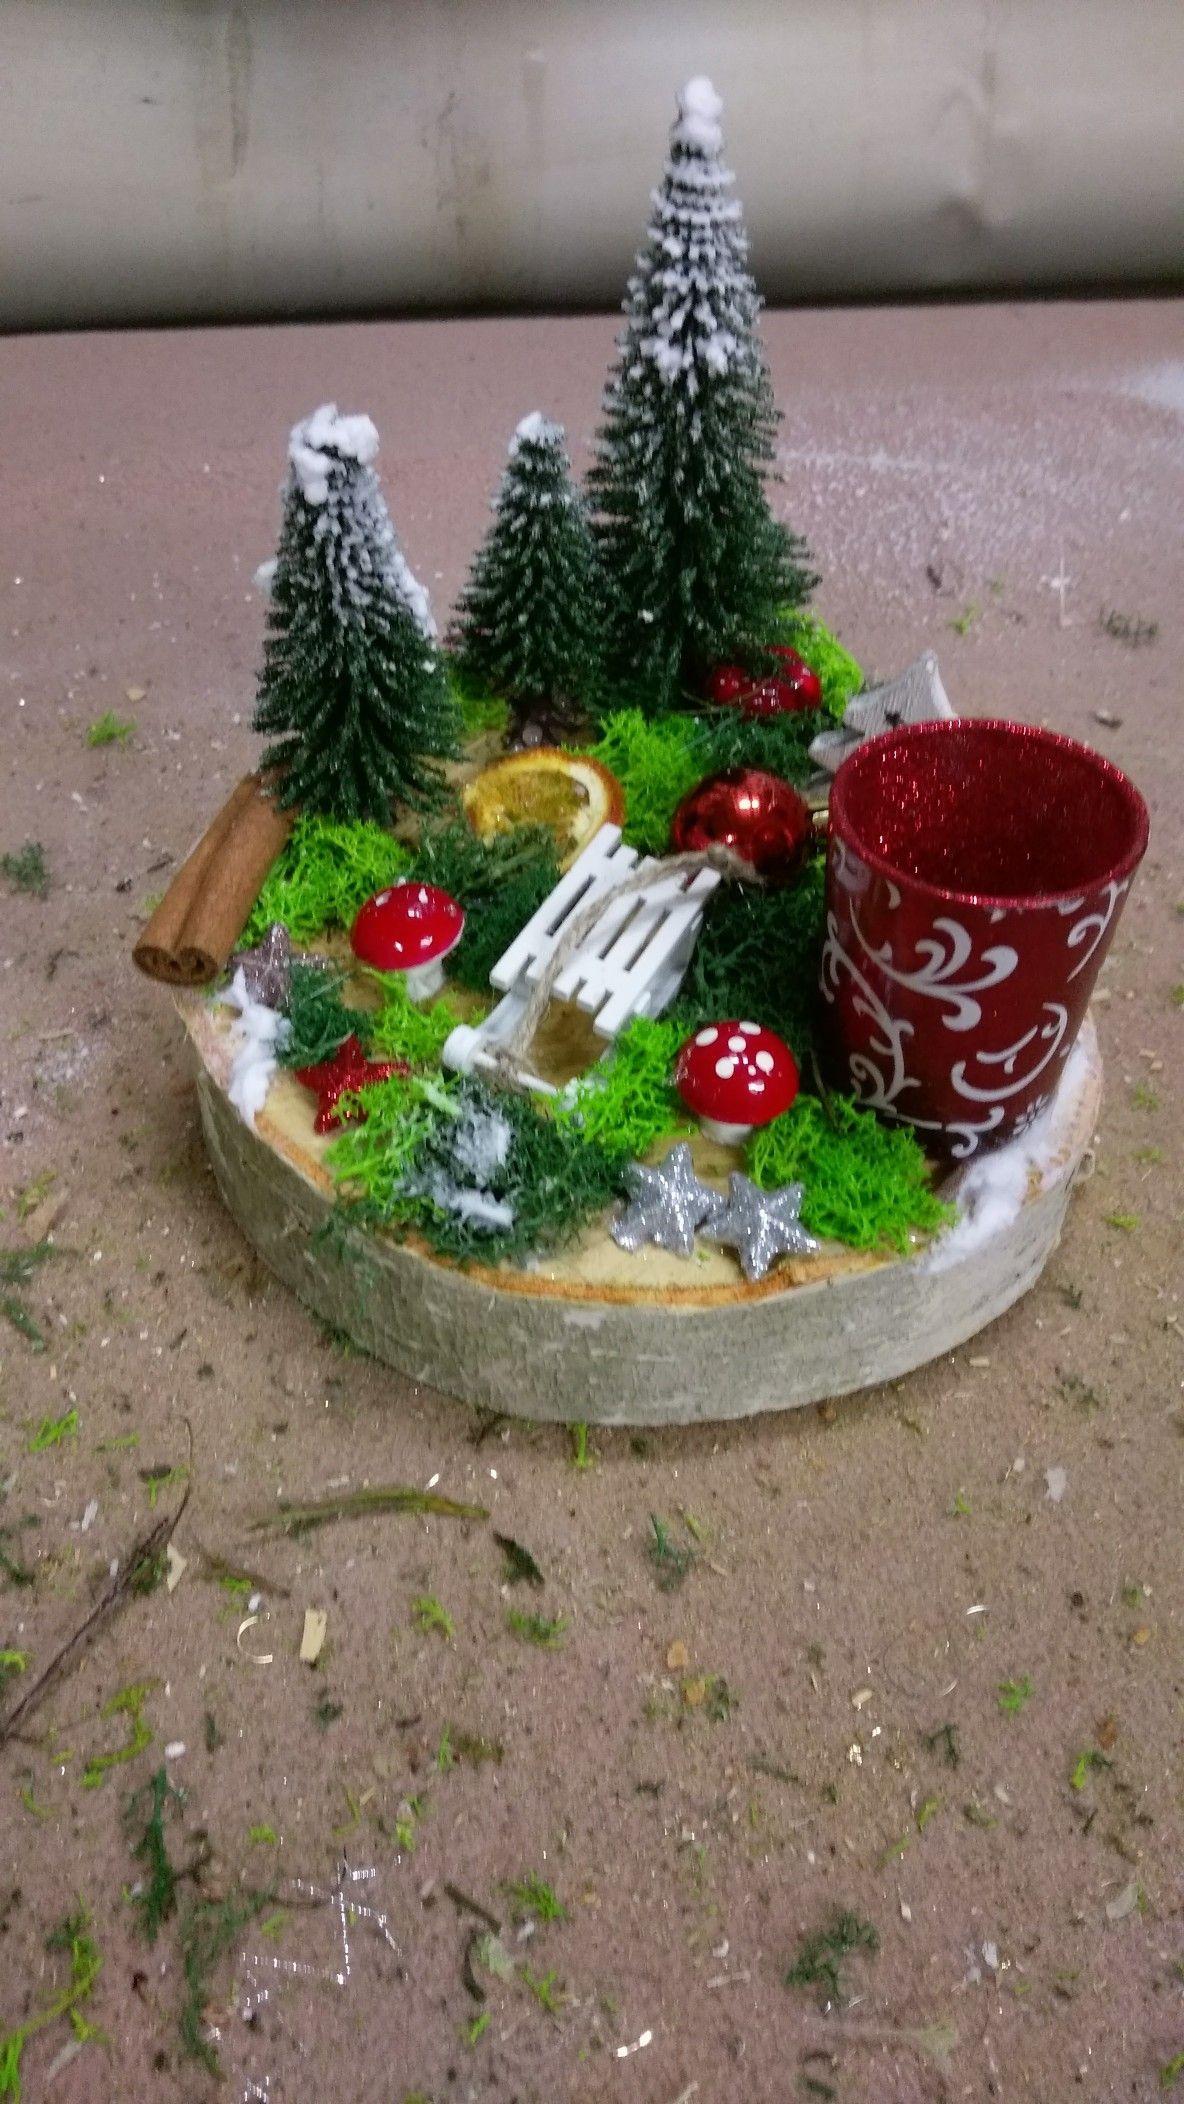 #herbstdekotischtablett #adventskranzaufbaumscheibe